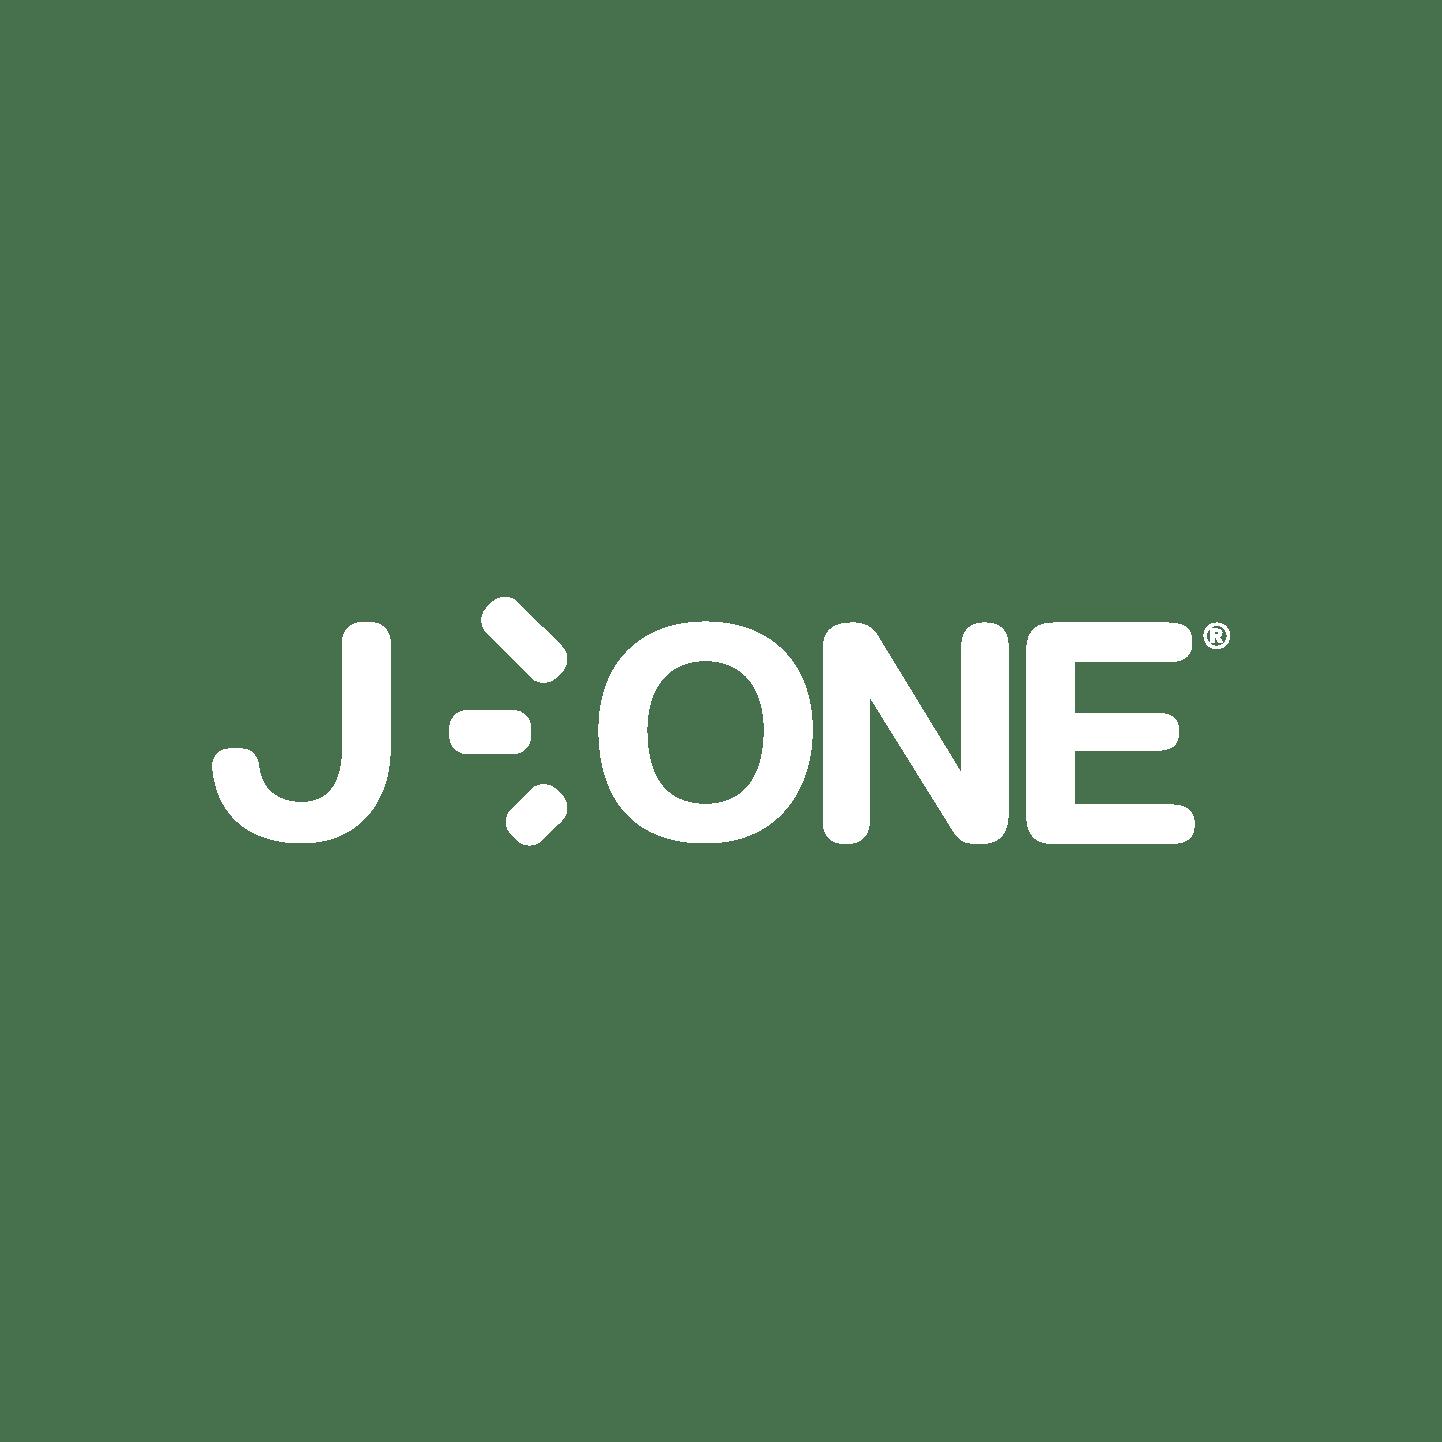 Logo J One